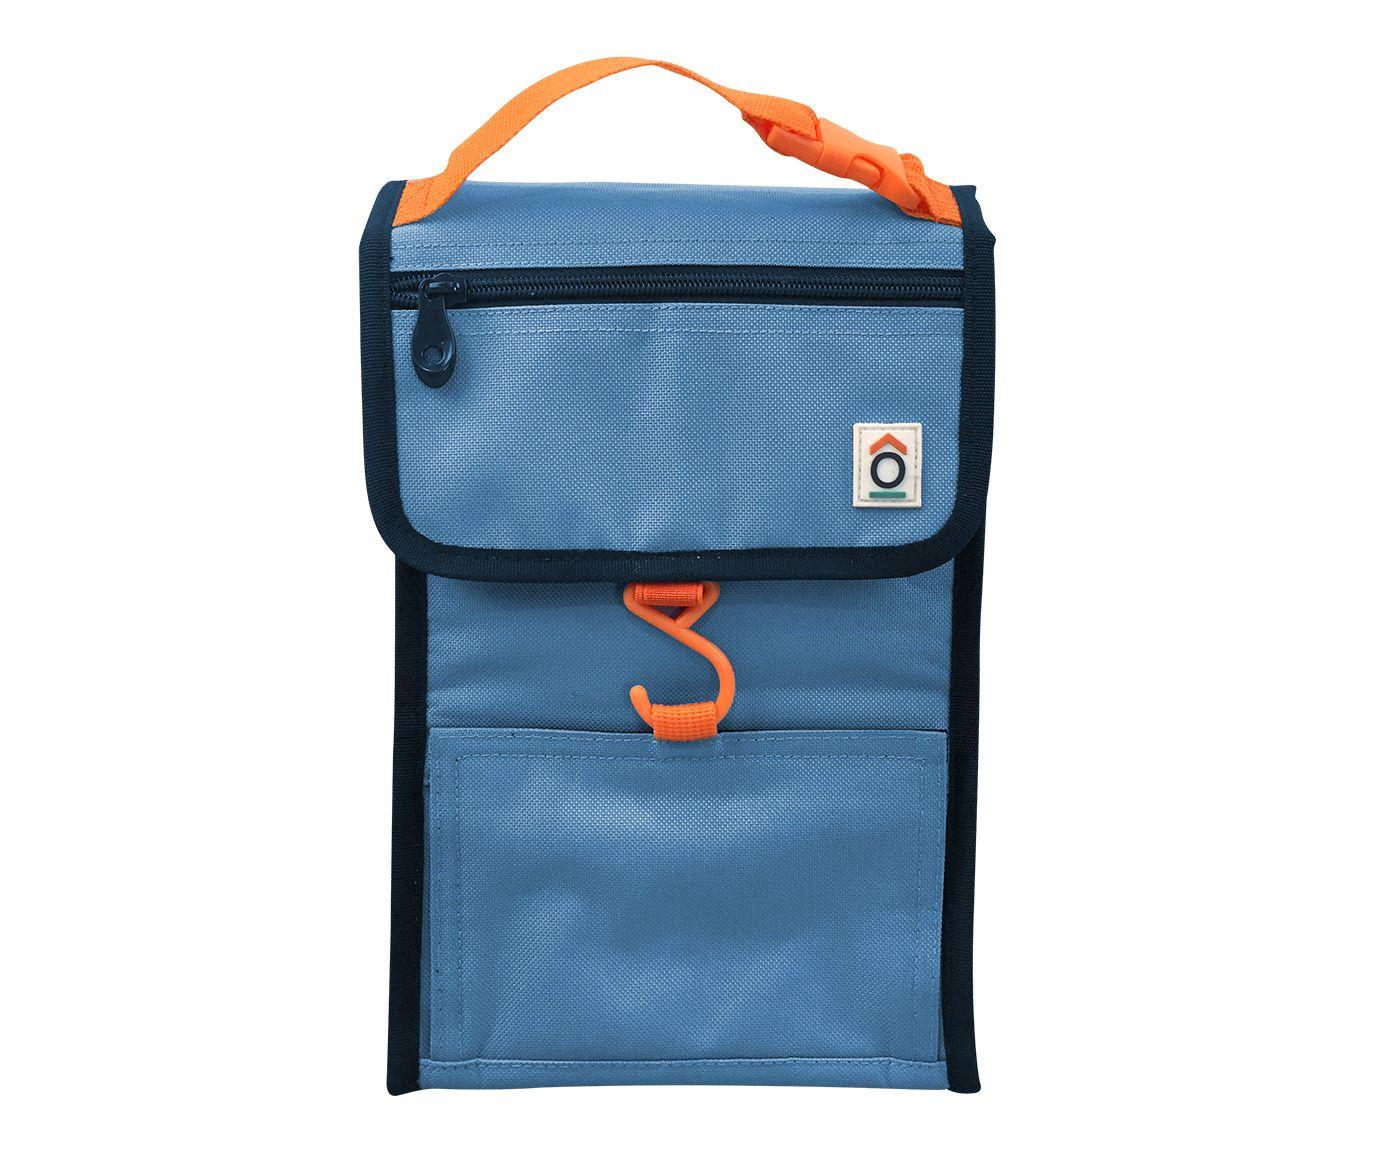 Bolsa Térmica Congelável Duplex Doux Azul - 6L   Westwing.com.br